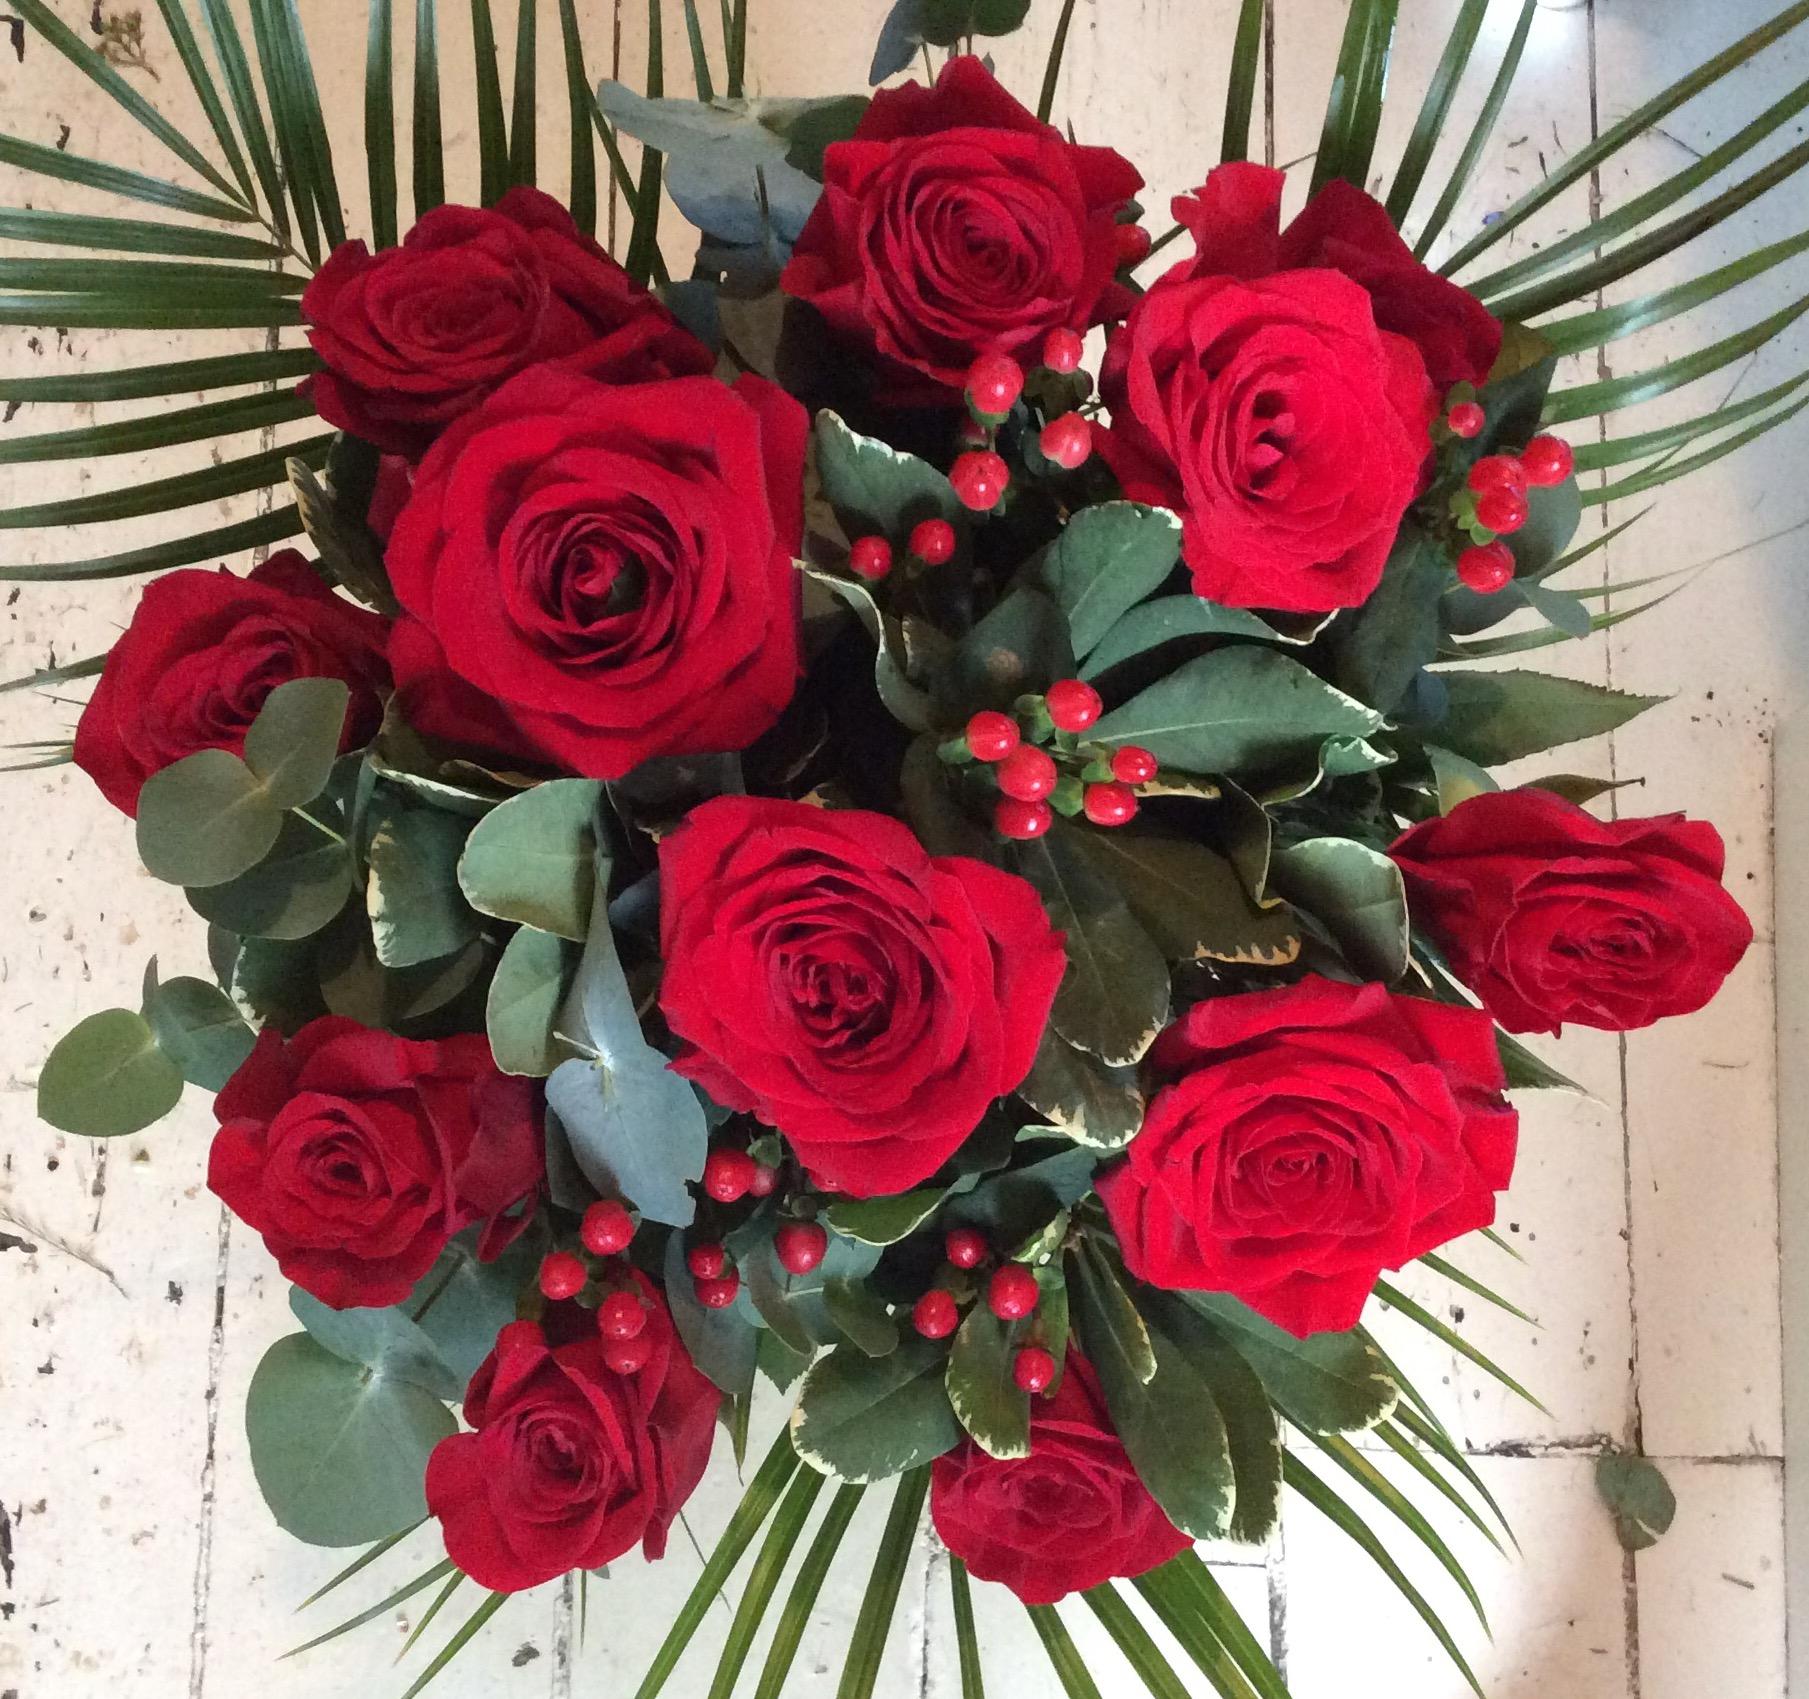 12 Red Rose Valentine Bouquet - Flowers By Alison | Bristol Florist